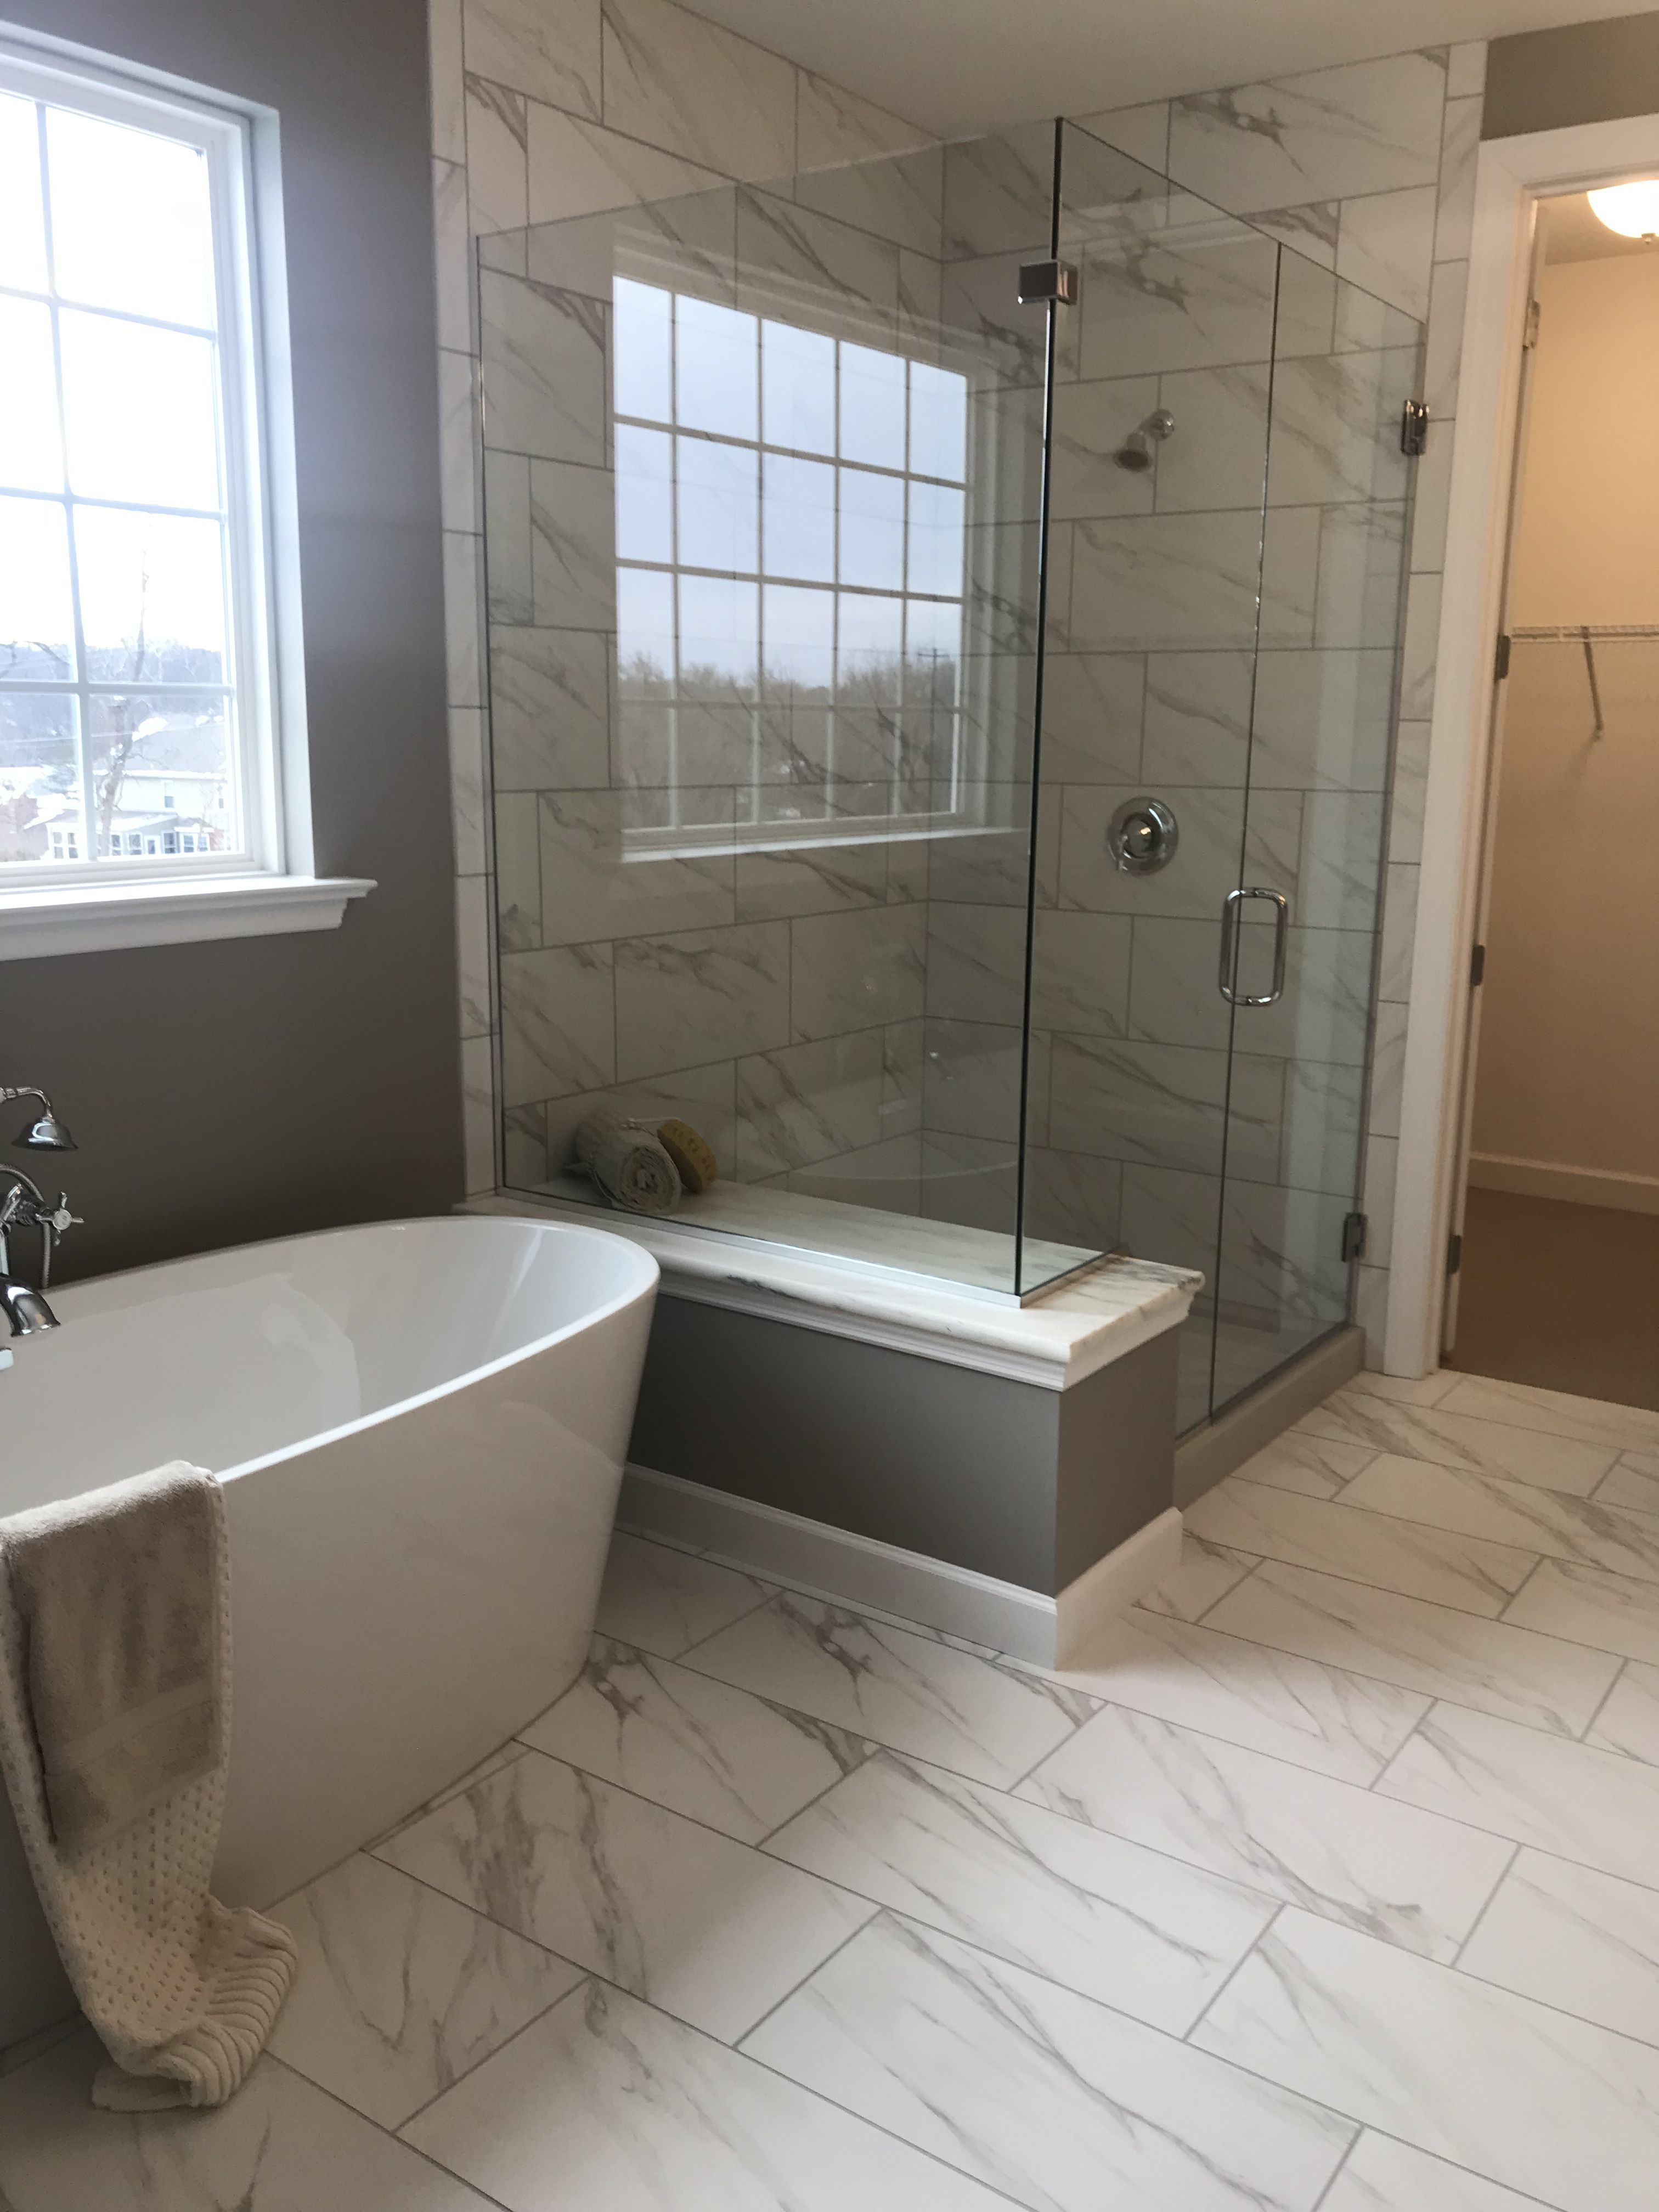 Luxurybathroomplan Master Bedroom Bathroom Bathroom Remodel Master Bathroom Design